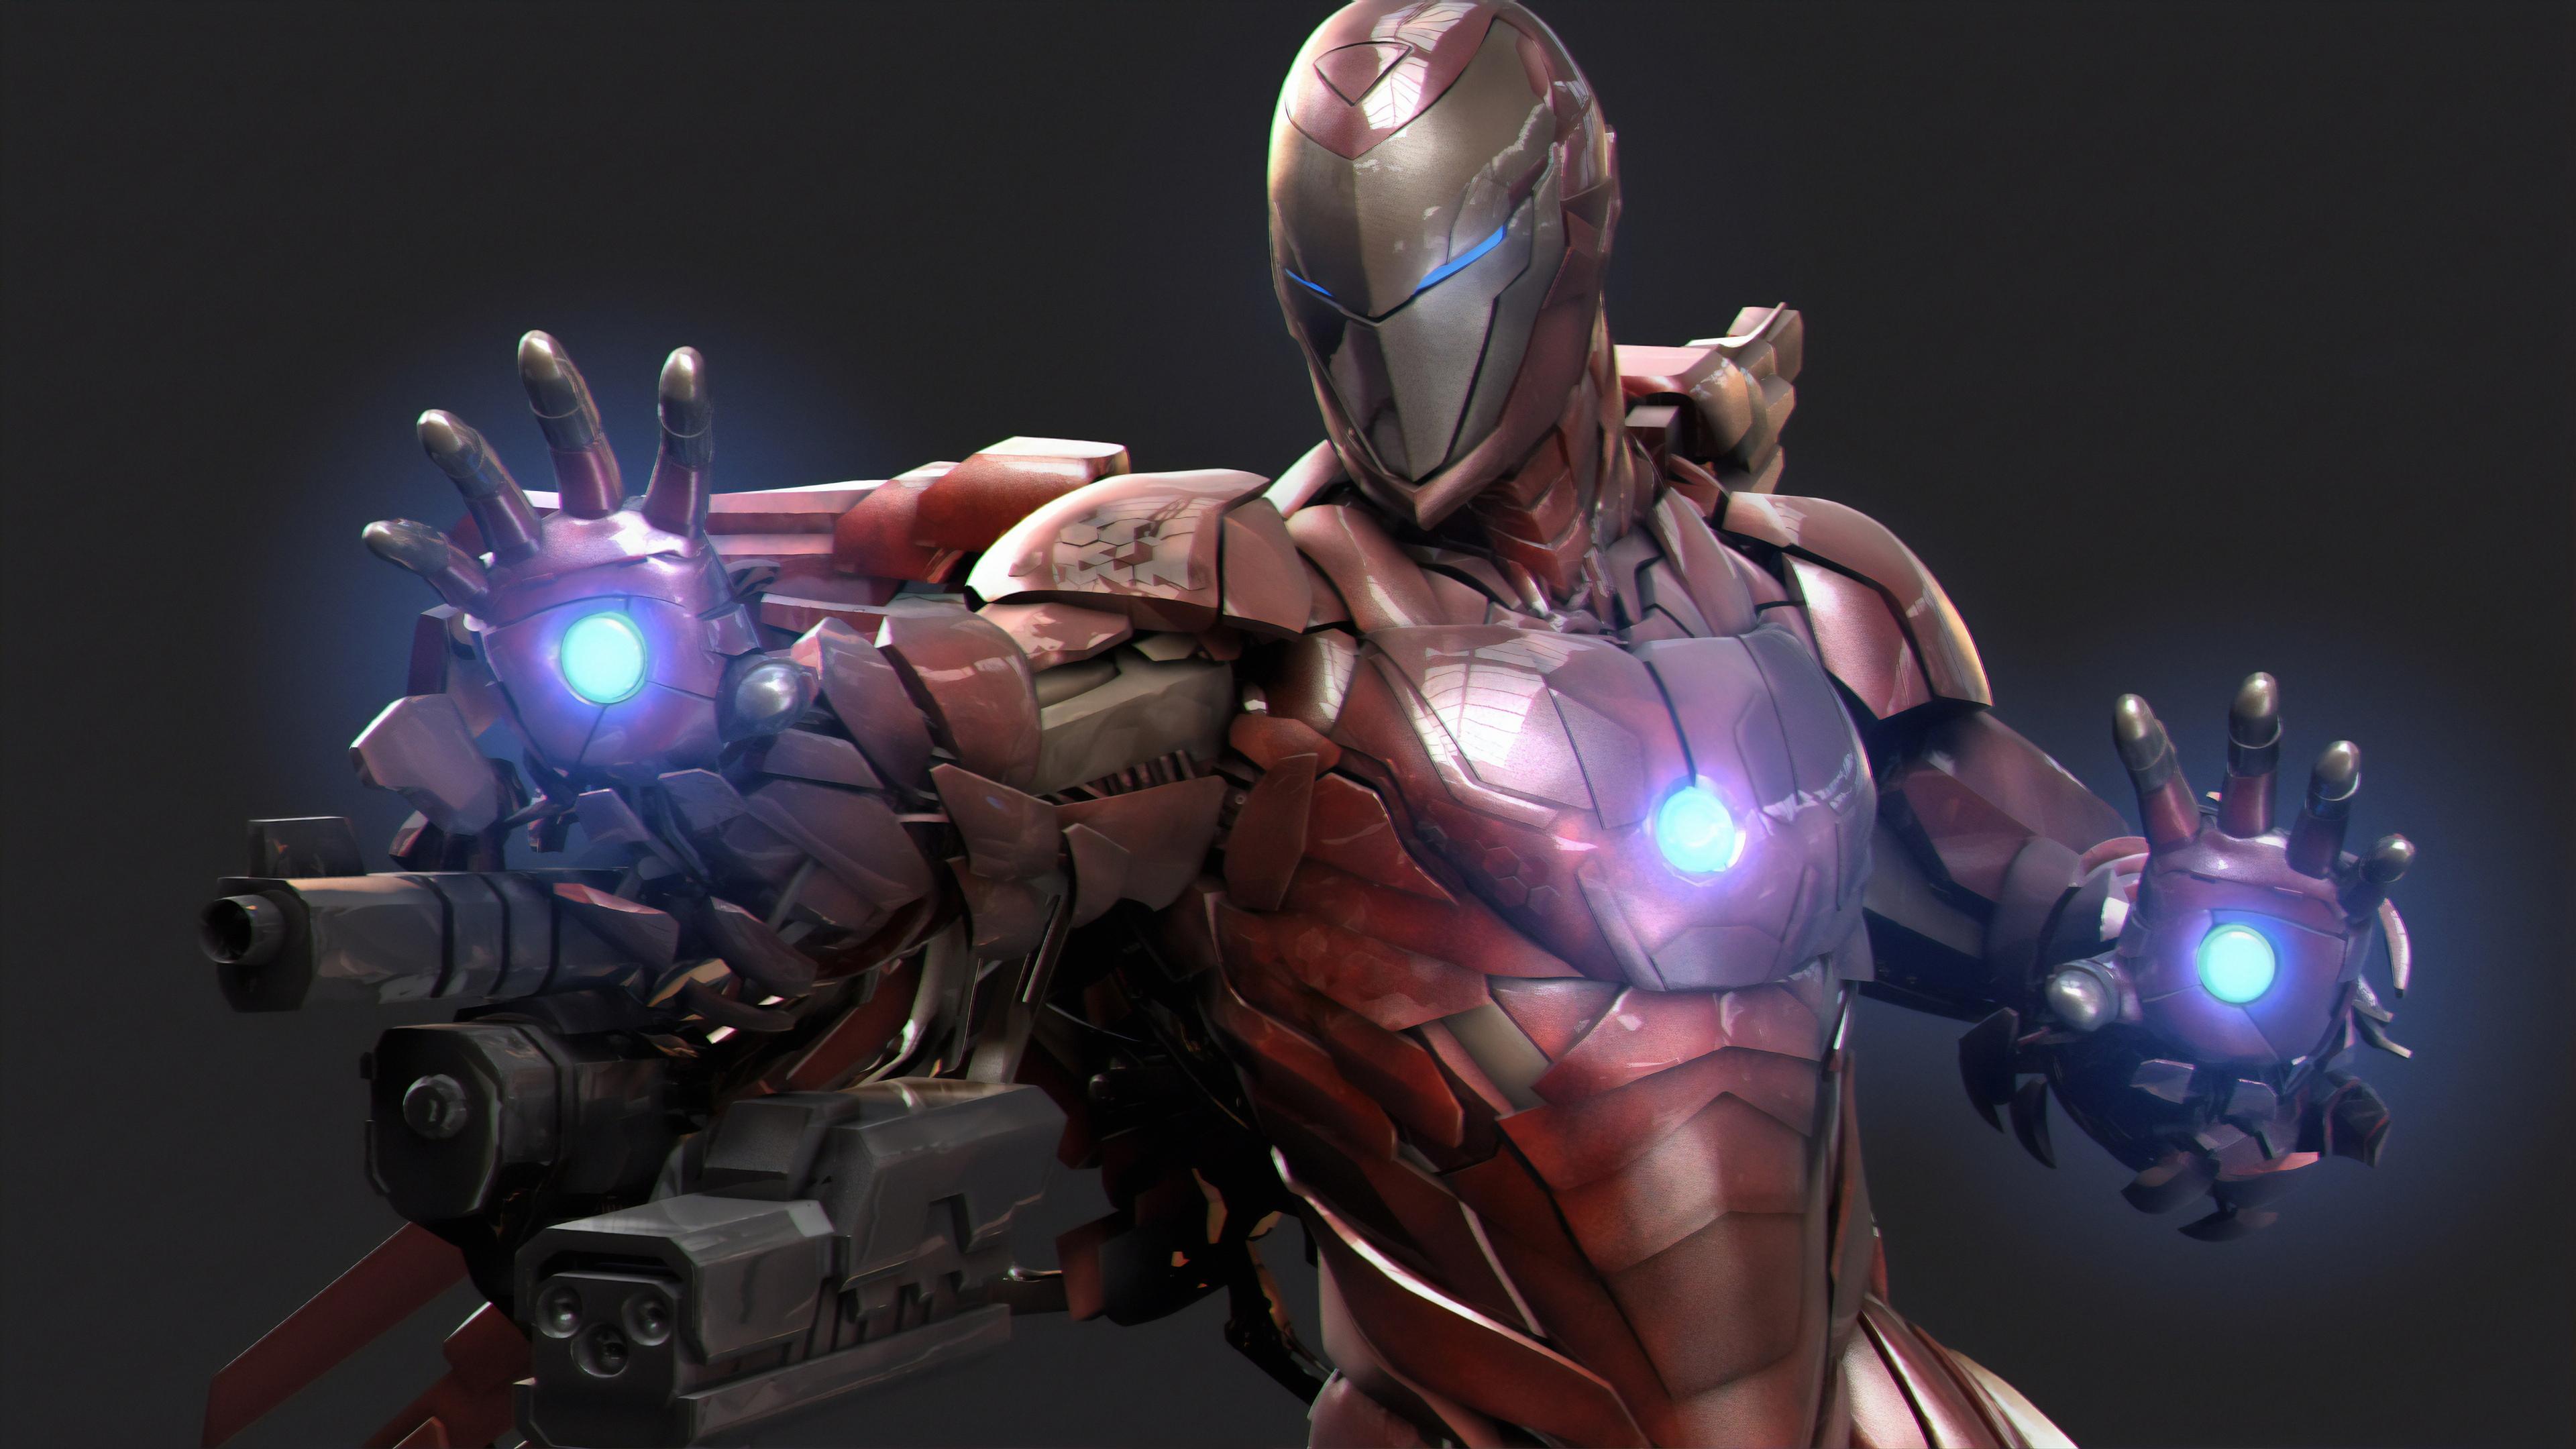 art new iron man 1565053245 - Art New Iron Man - superheroes wallpapers, iron man wallpapers, hd-wallpapers, digital art wallpapers, artwork wallpapers, artstation wallpapers, 4k-wallpapers